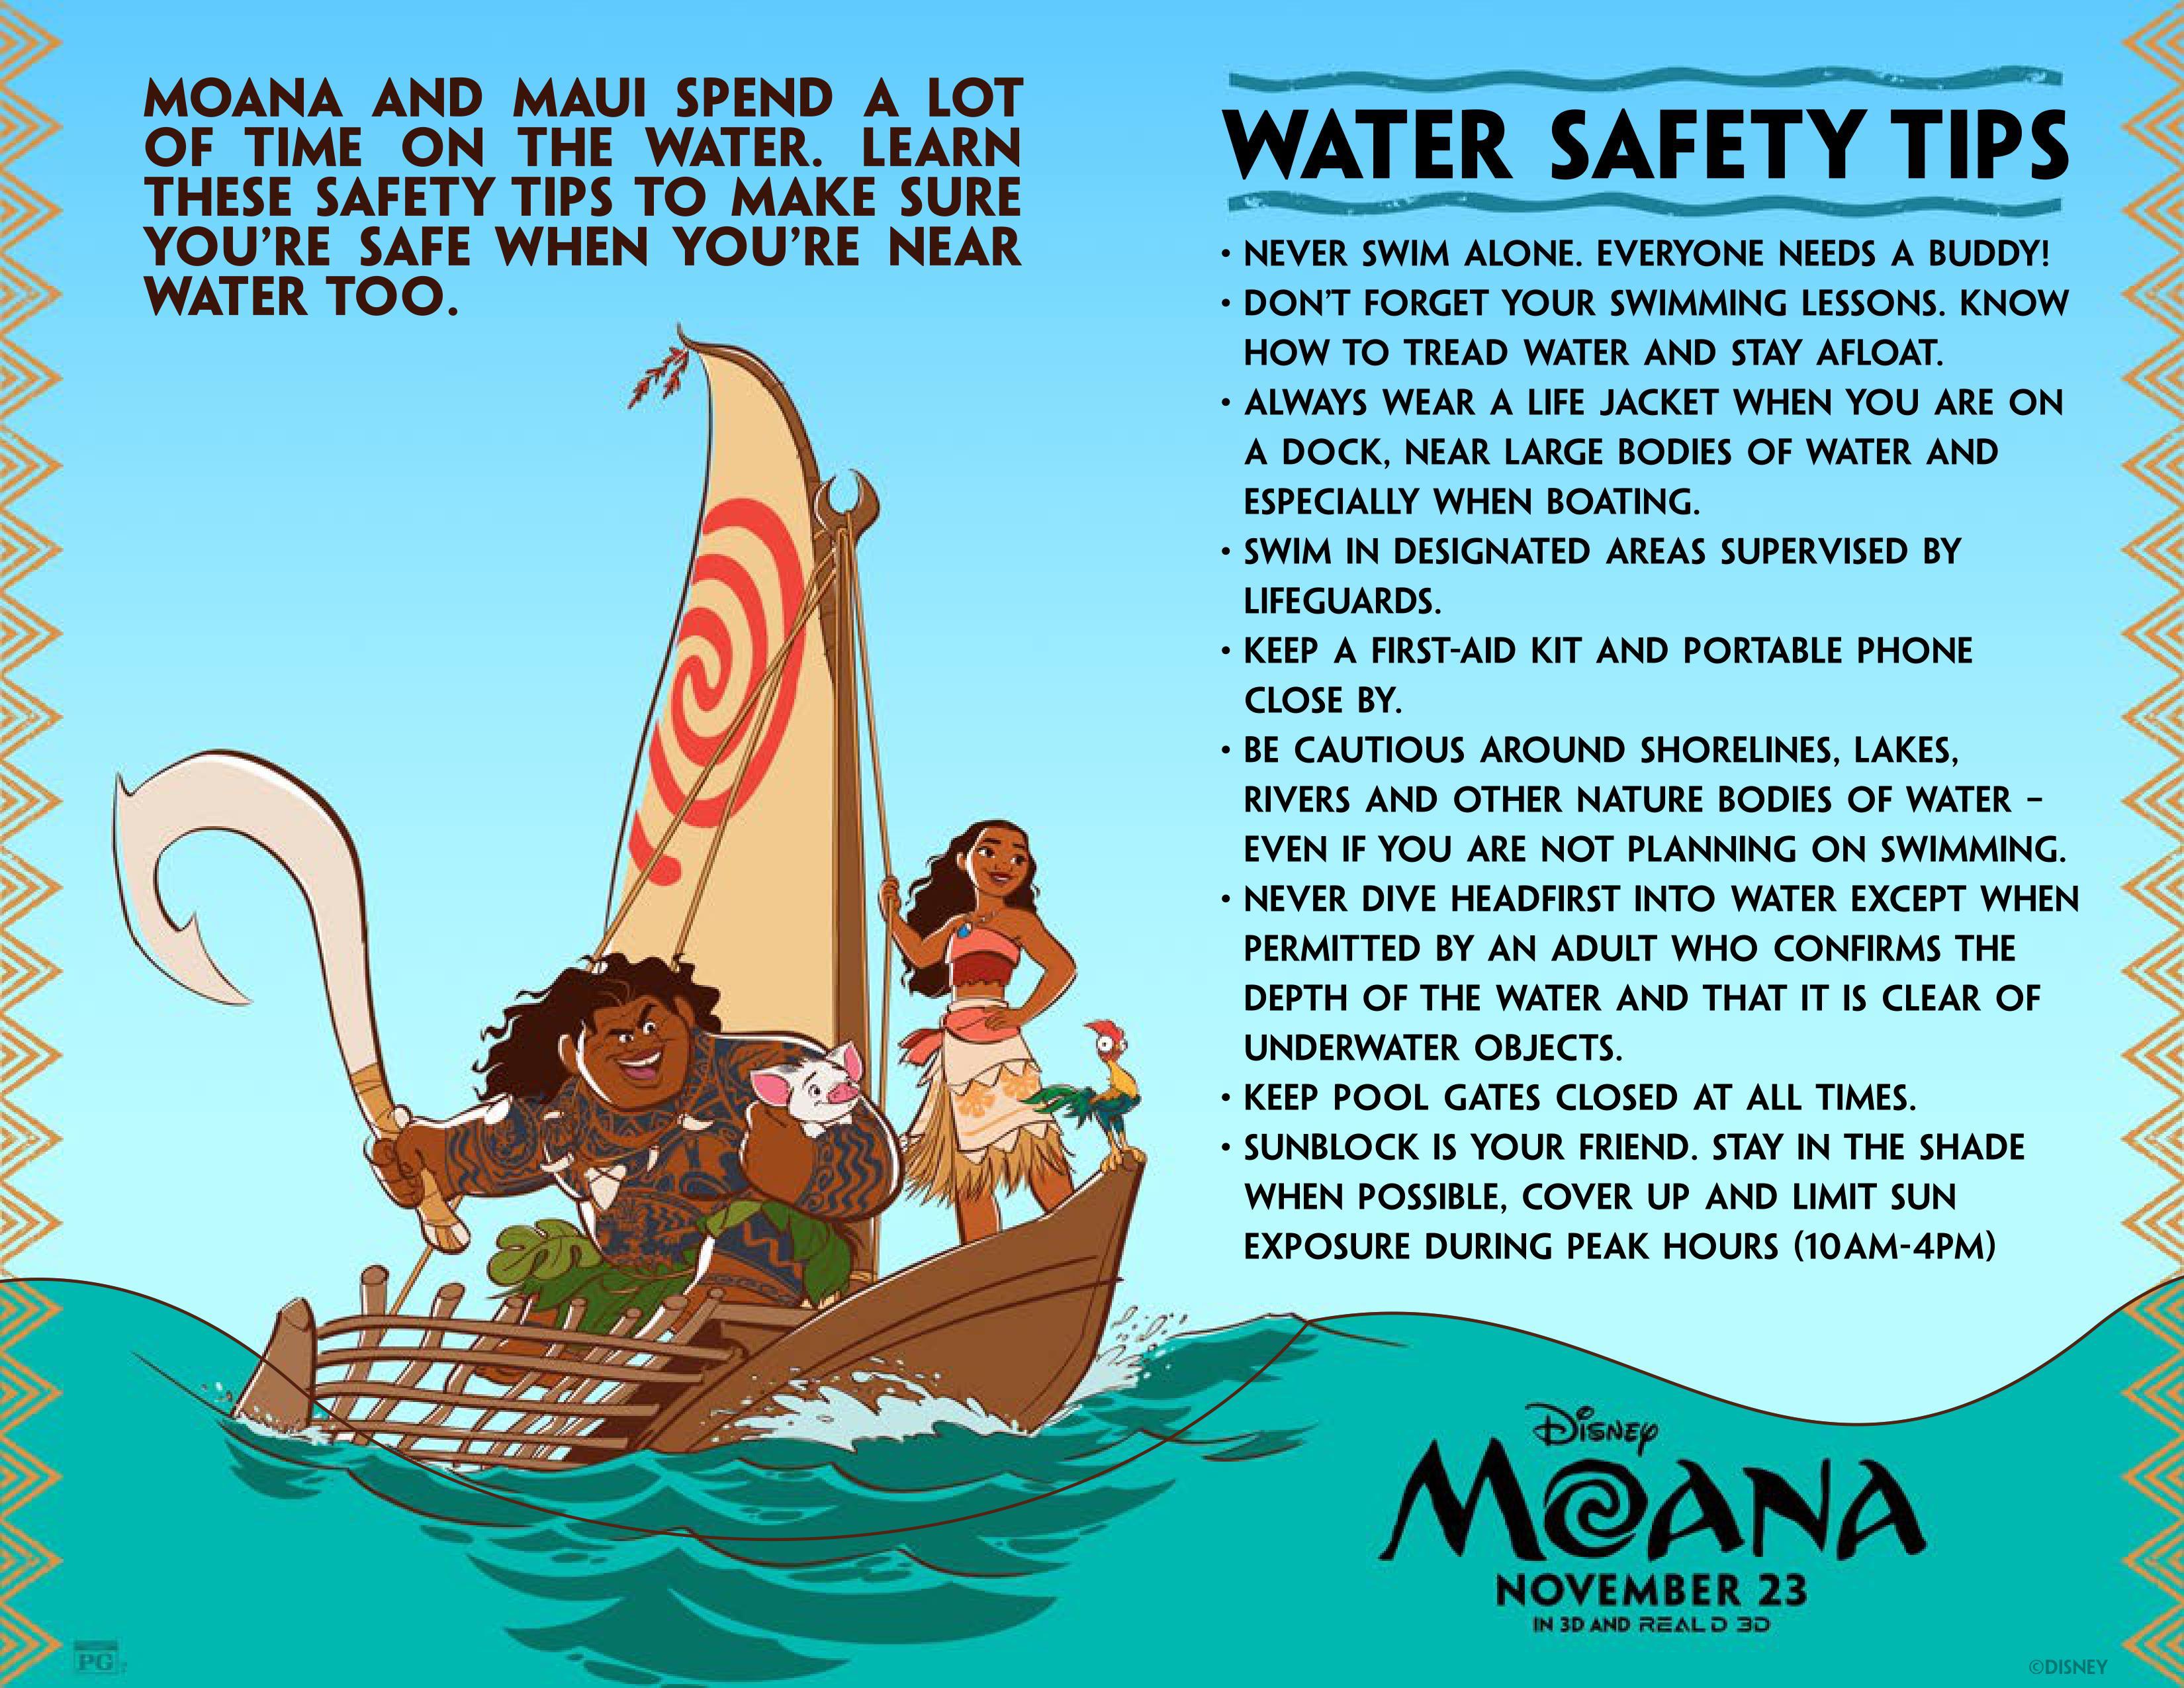 Disney Moana Water Safety Tips